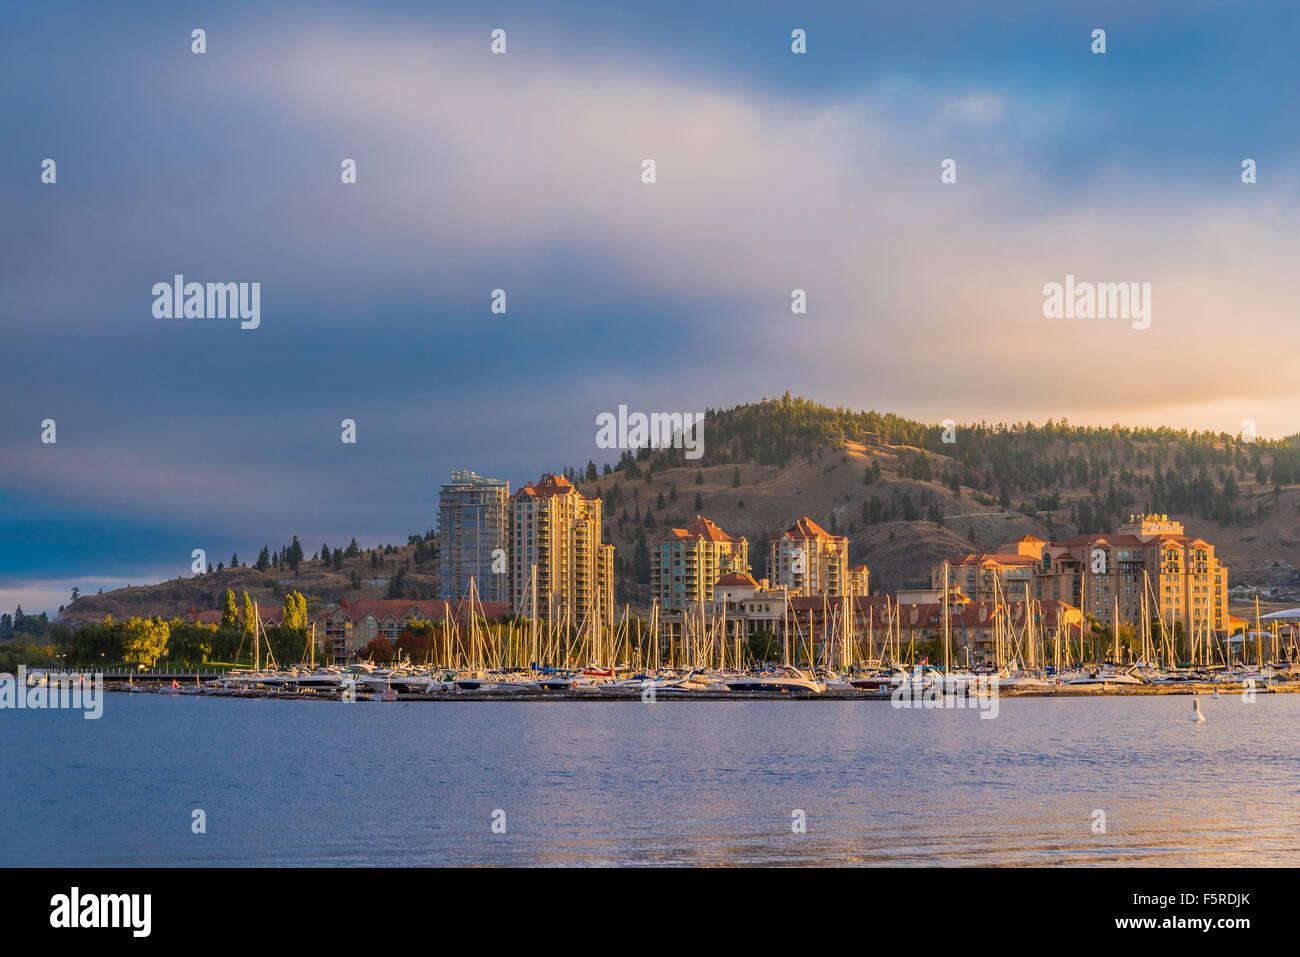 Kelowna Yacht Club and skyline, Kelowna, British Columbia, Canada - Stock Image